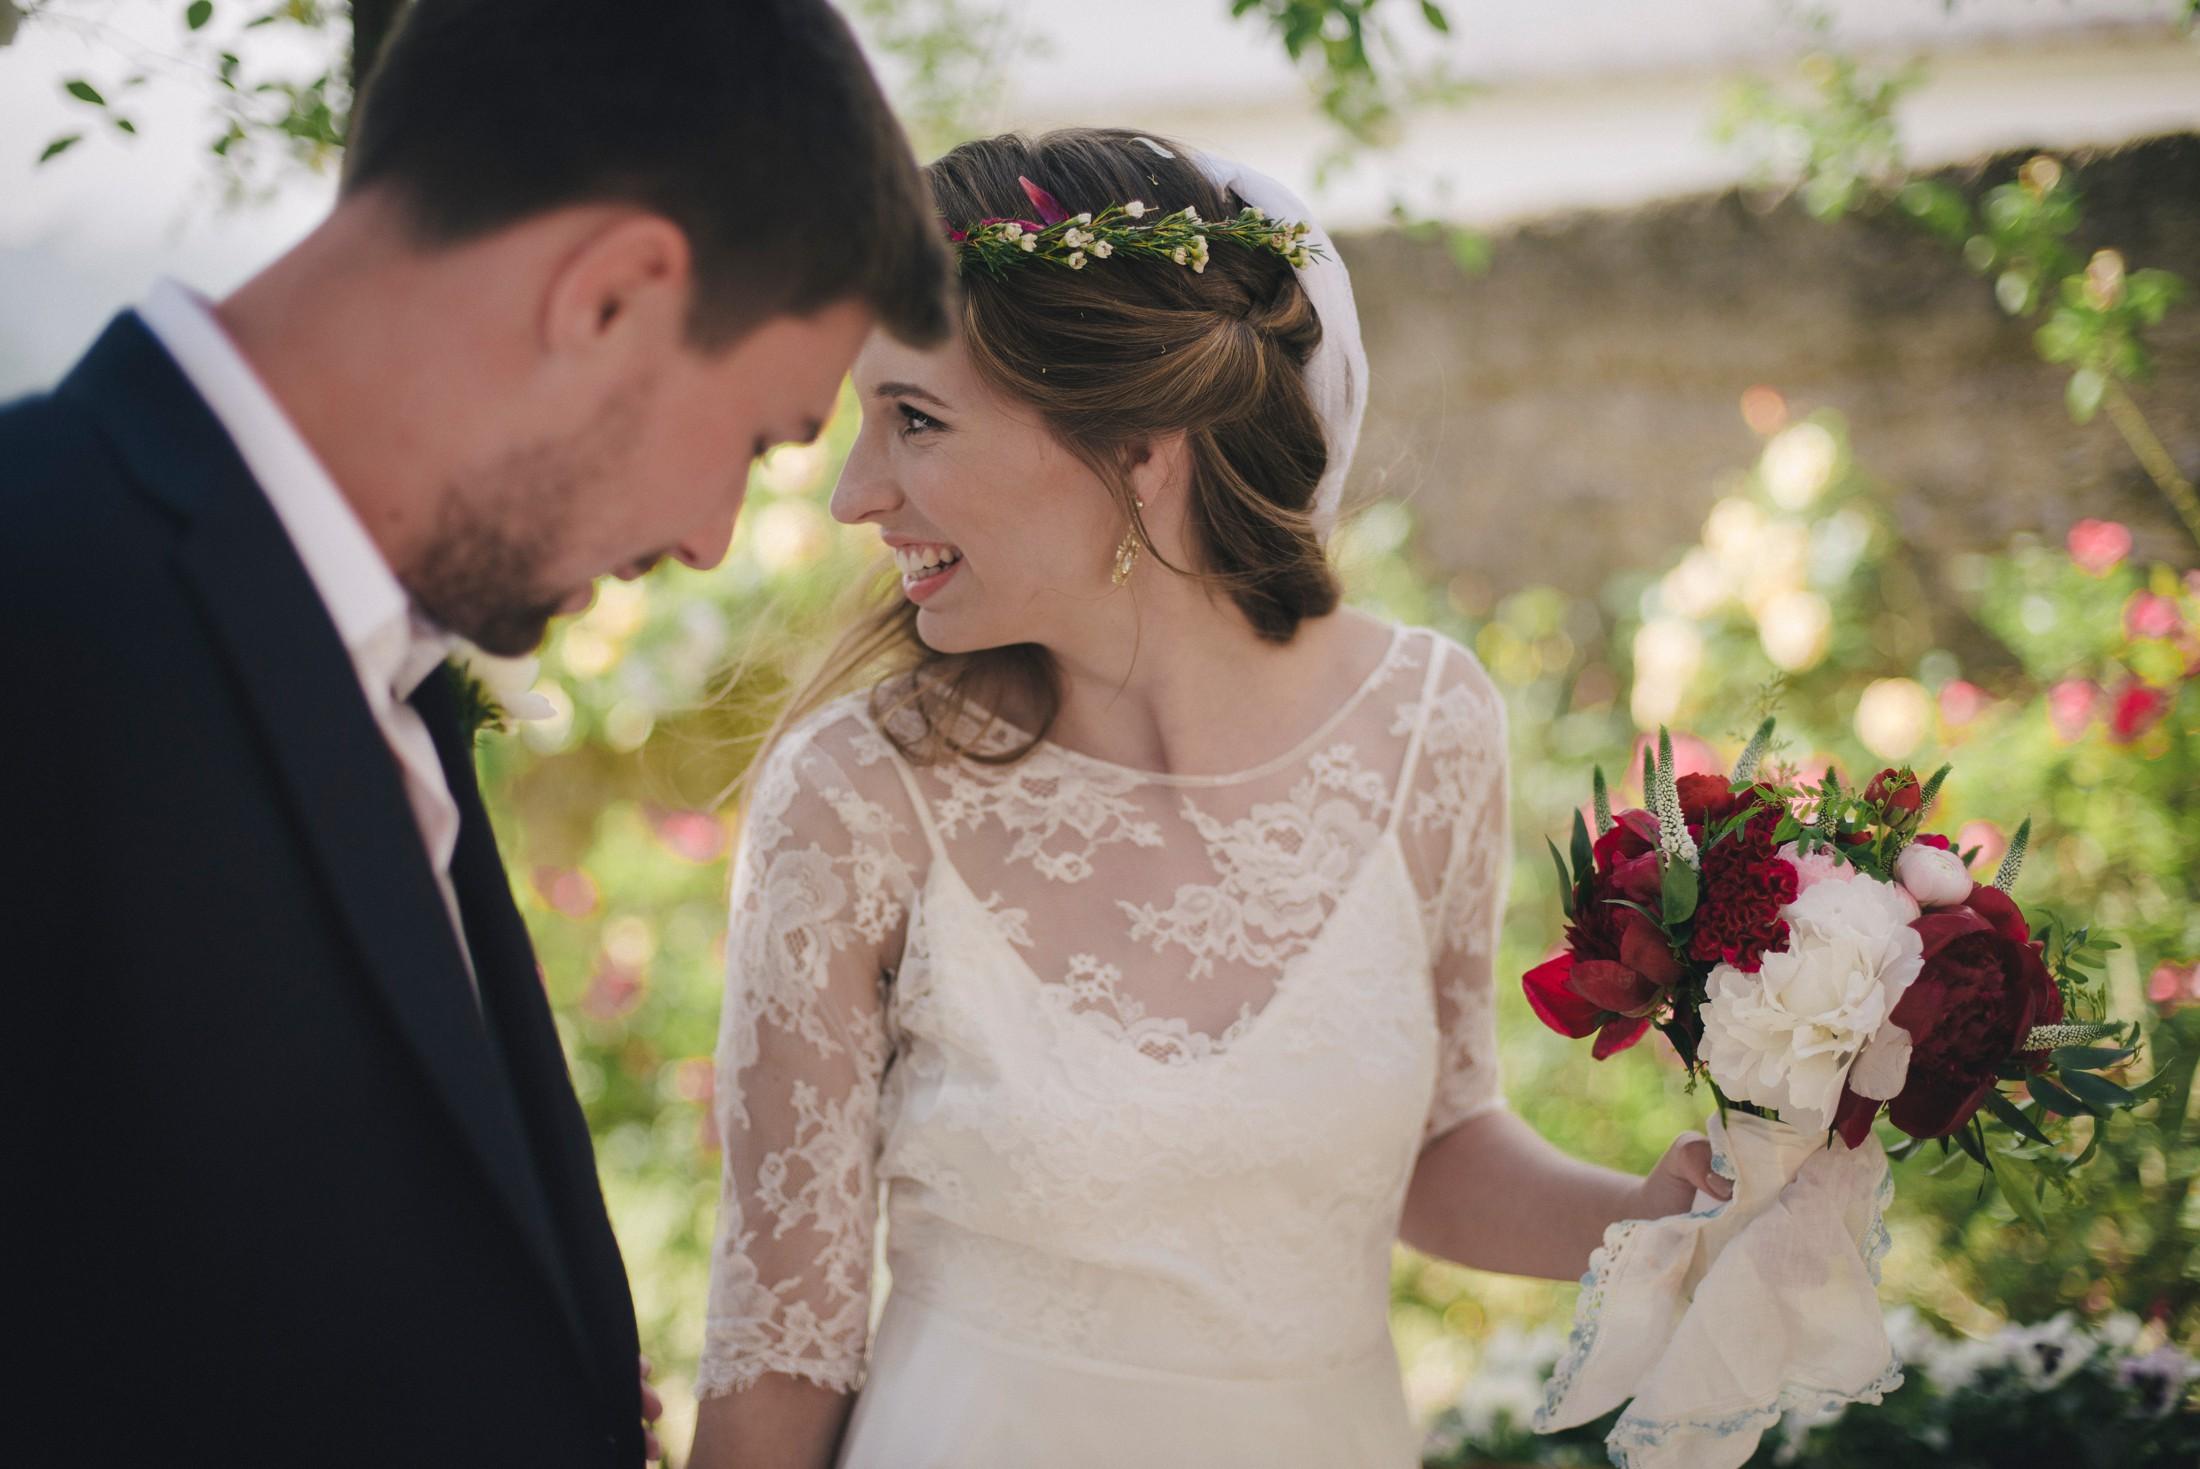 adriana alfano bride and groom's portrait in ravello italy